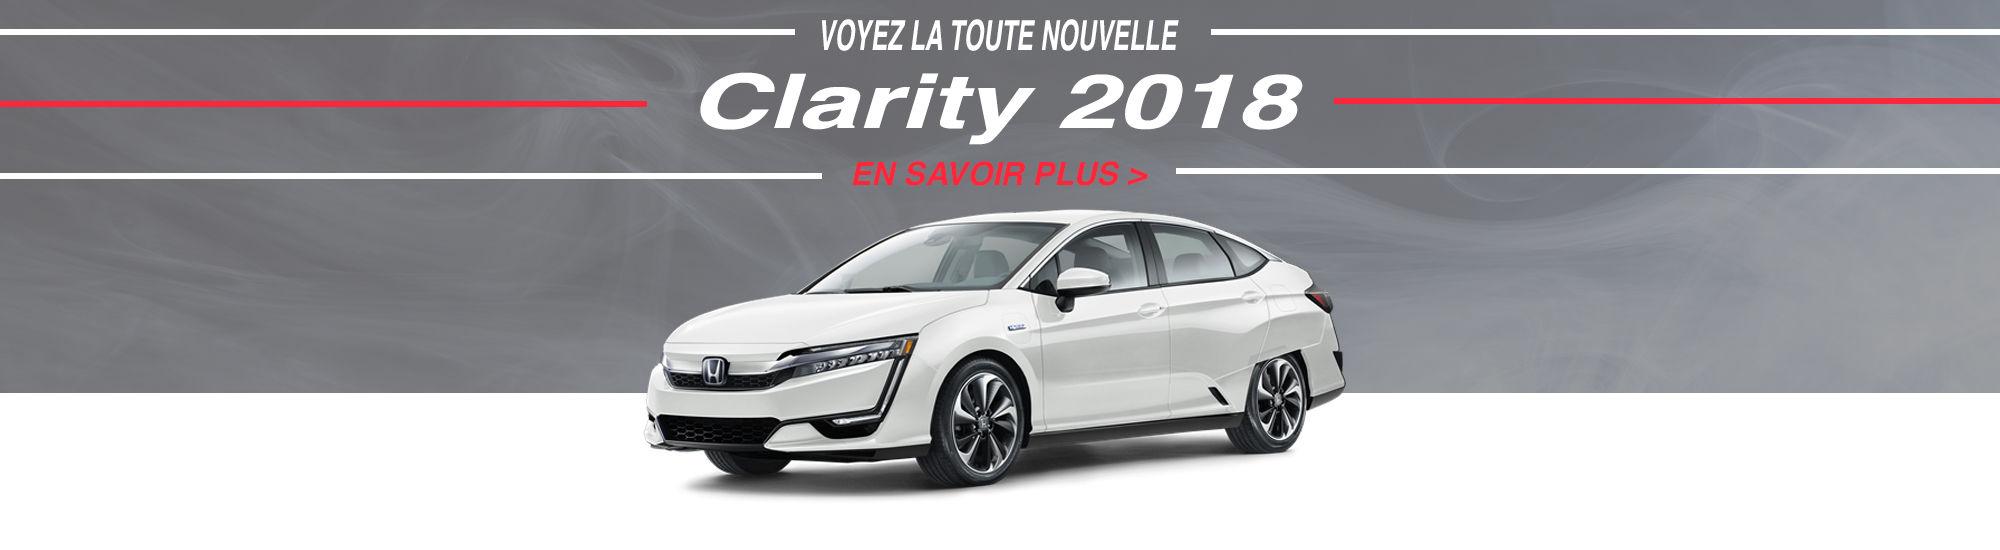 Clarity 2018